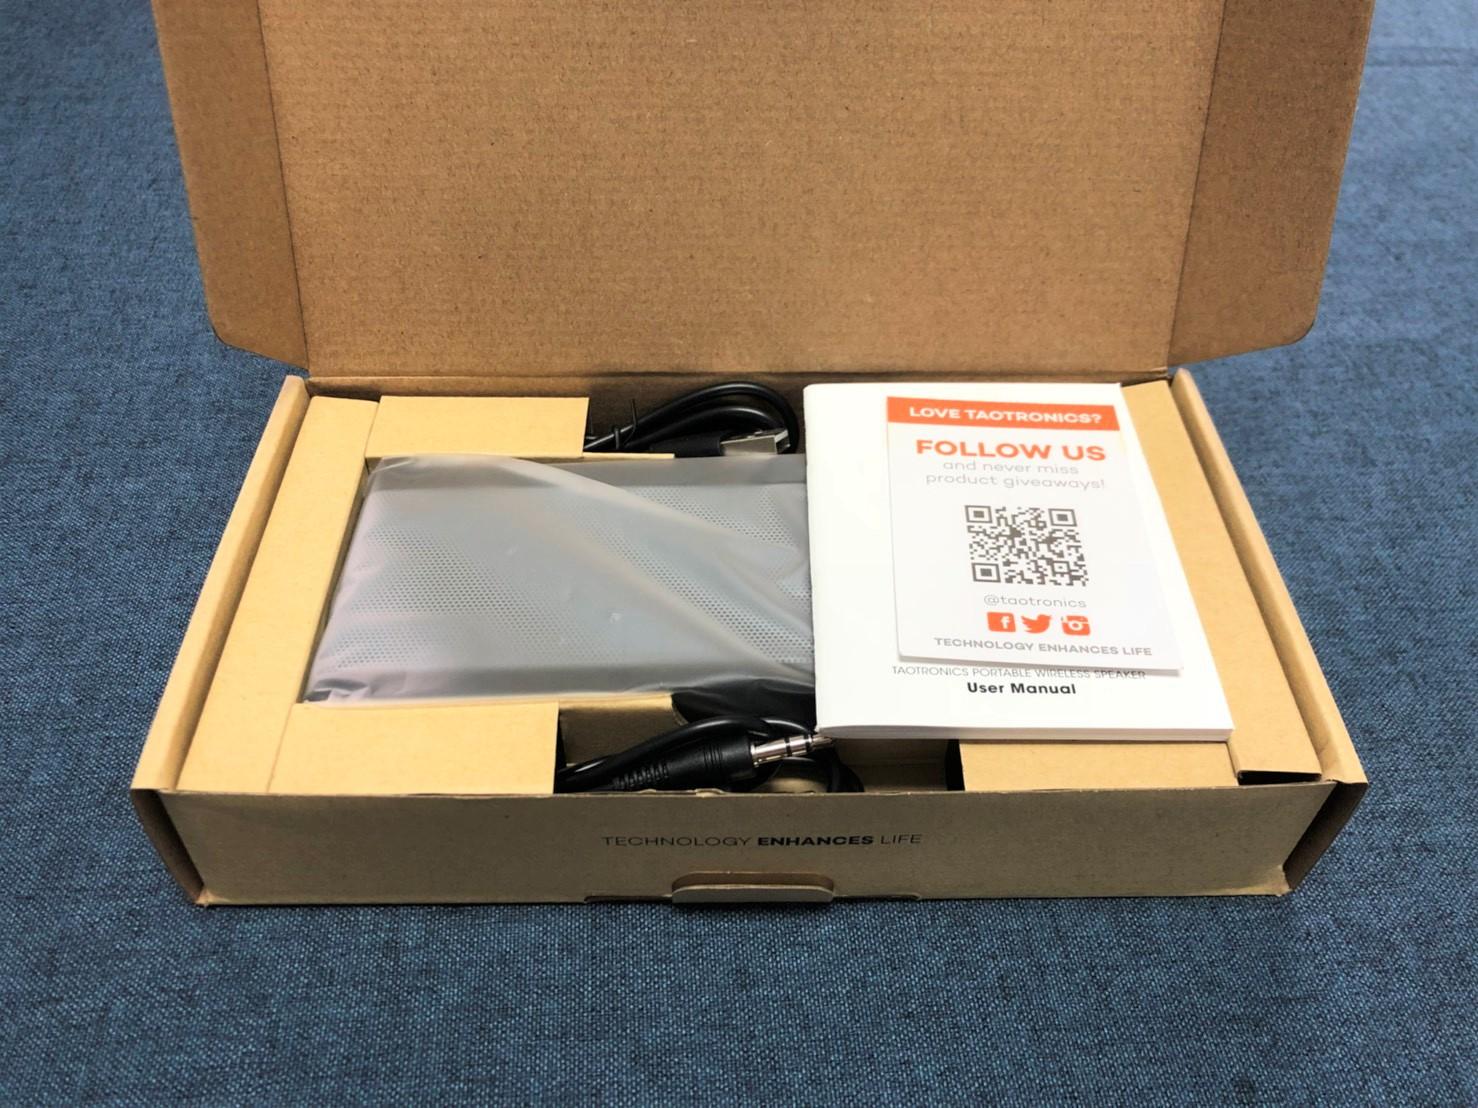 TaoTronics TT-SK09防水藍芽喇叭推薦 - 內裝